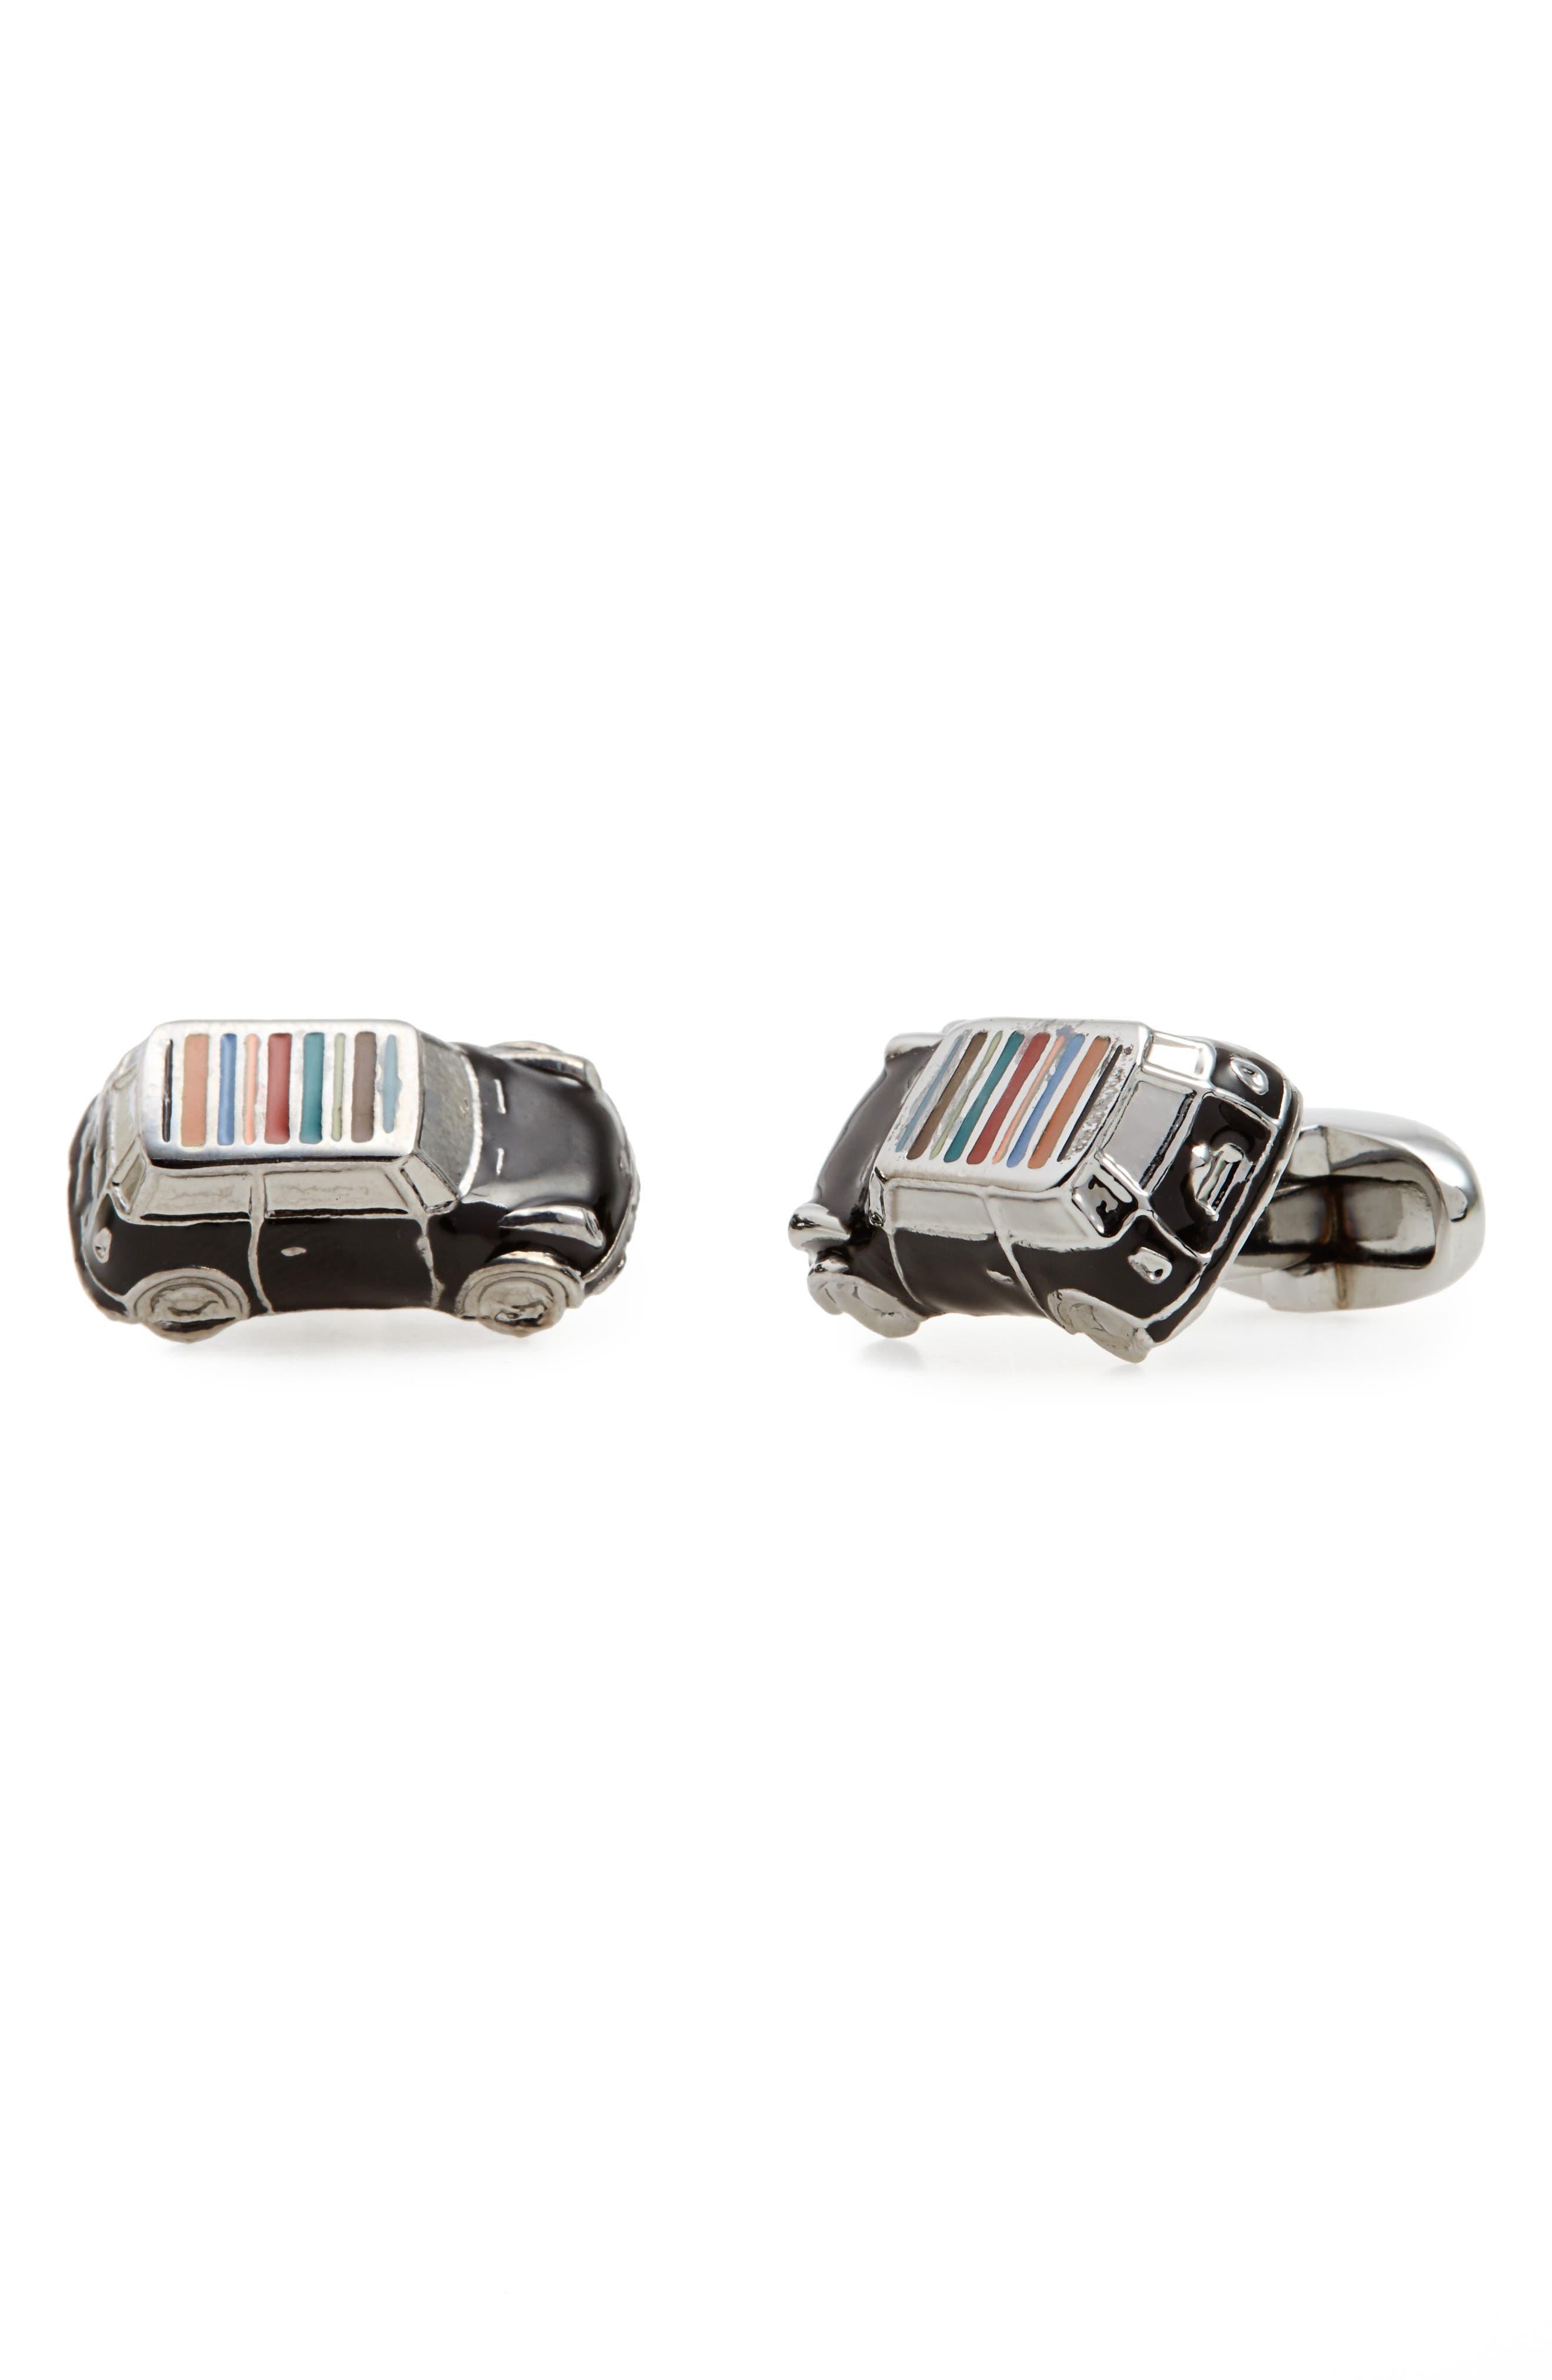 Enamel Stripe Car Cuff Links,                         Main,                         color, Silver Multi